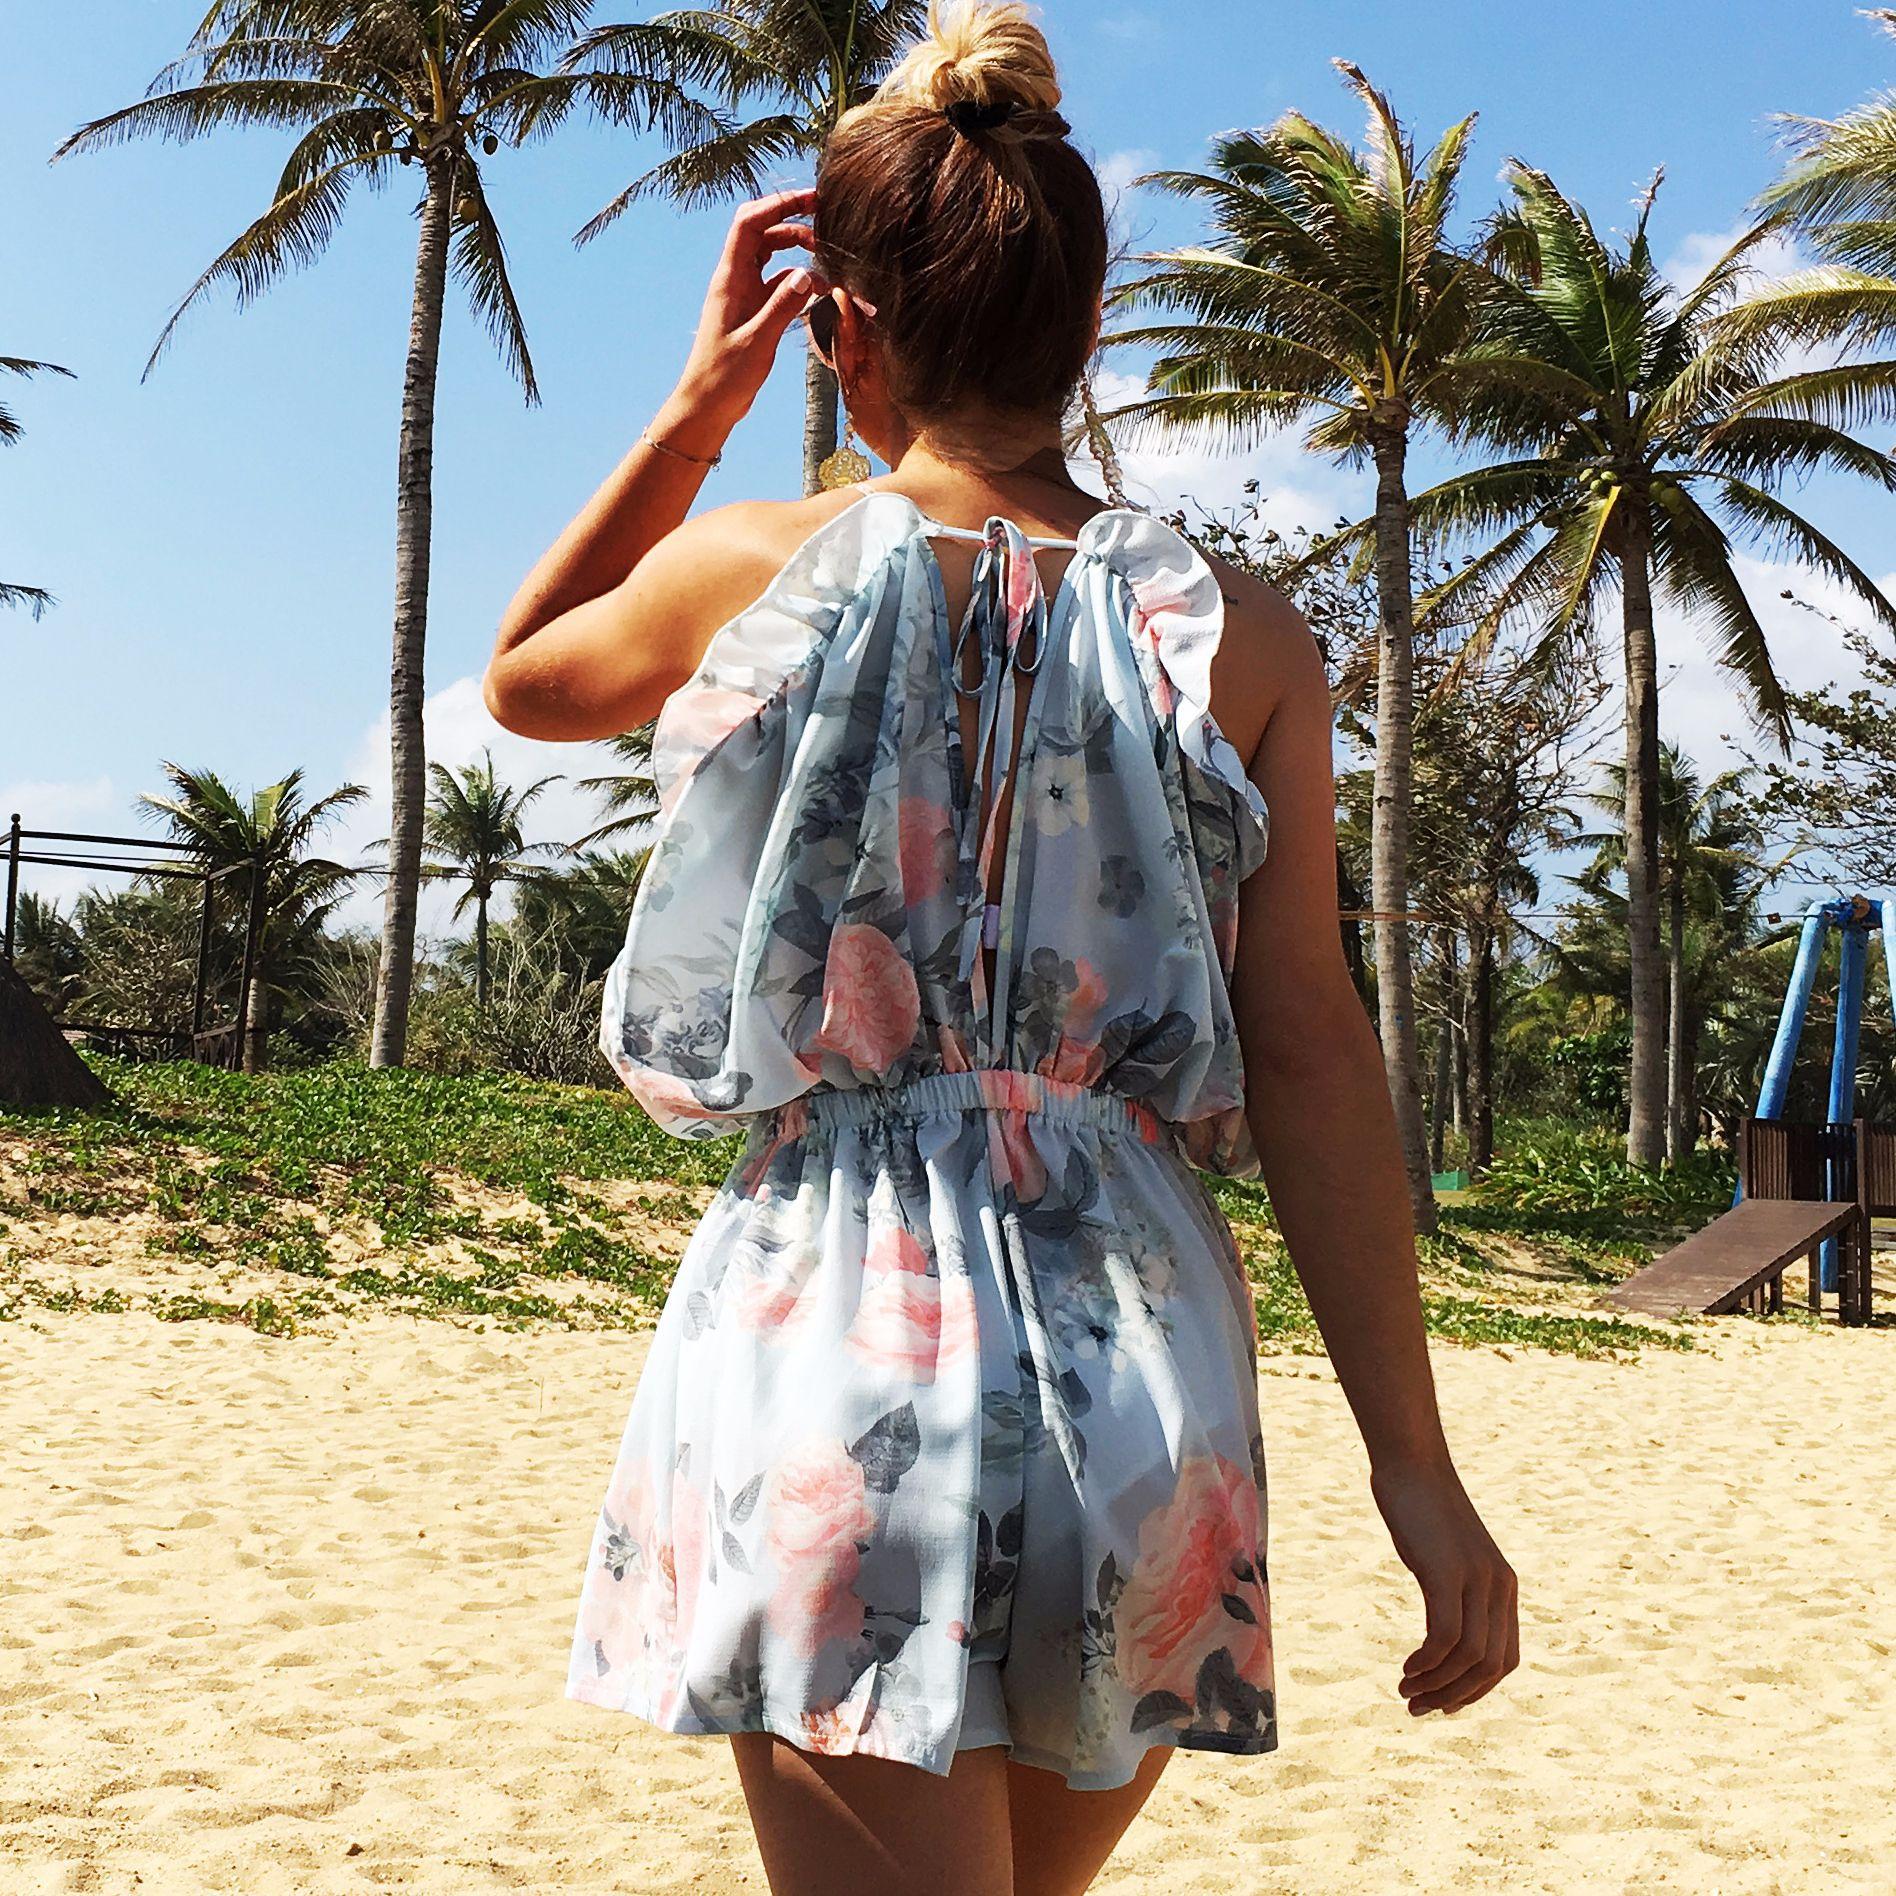 New Hot V-neck Print Sling Jumpsuit Shorts Ruffled Holidy Style Backless Chiffon Playsuits